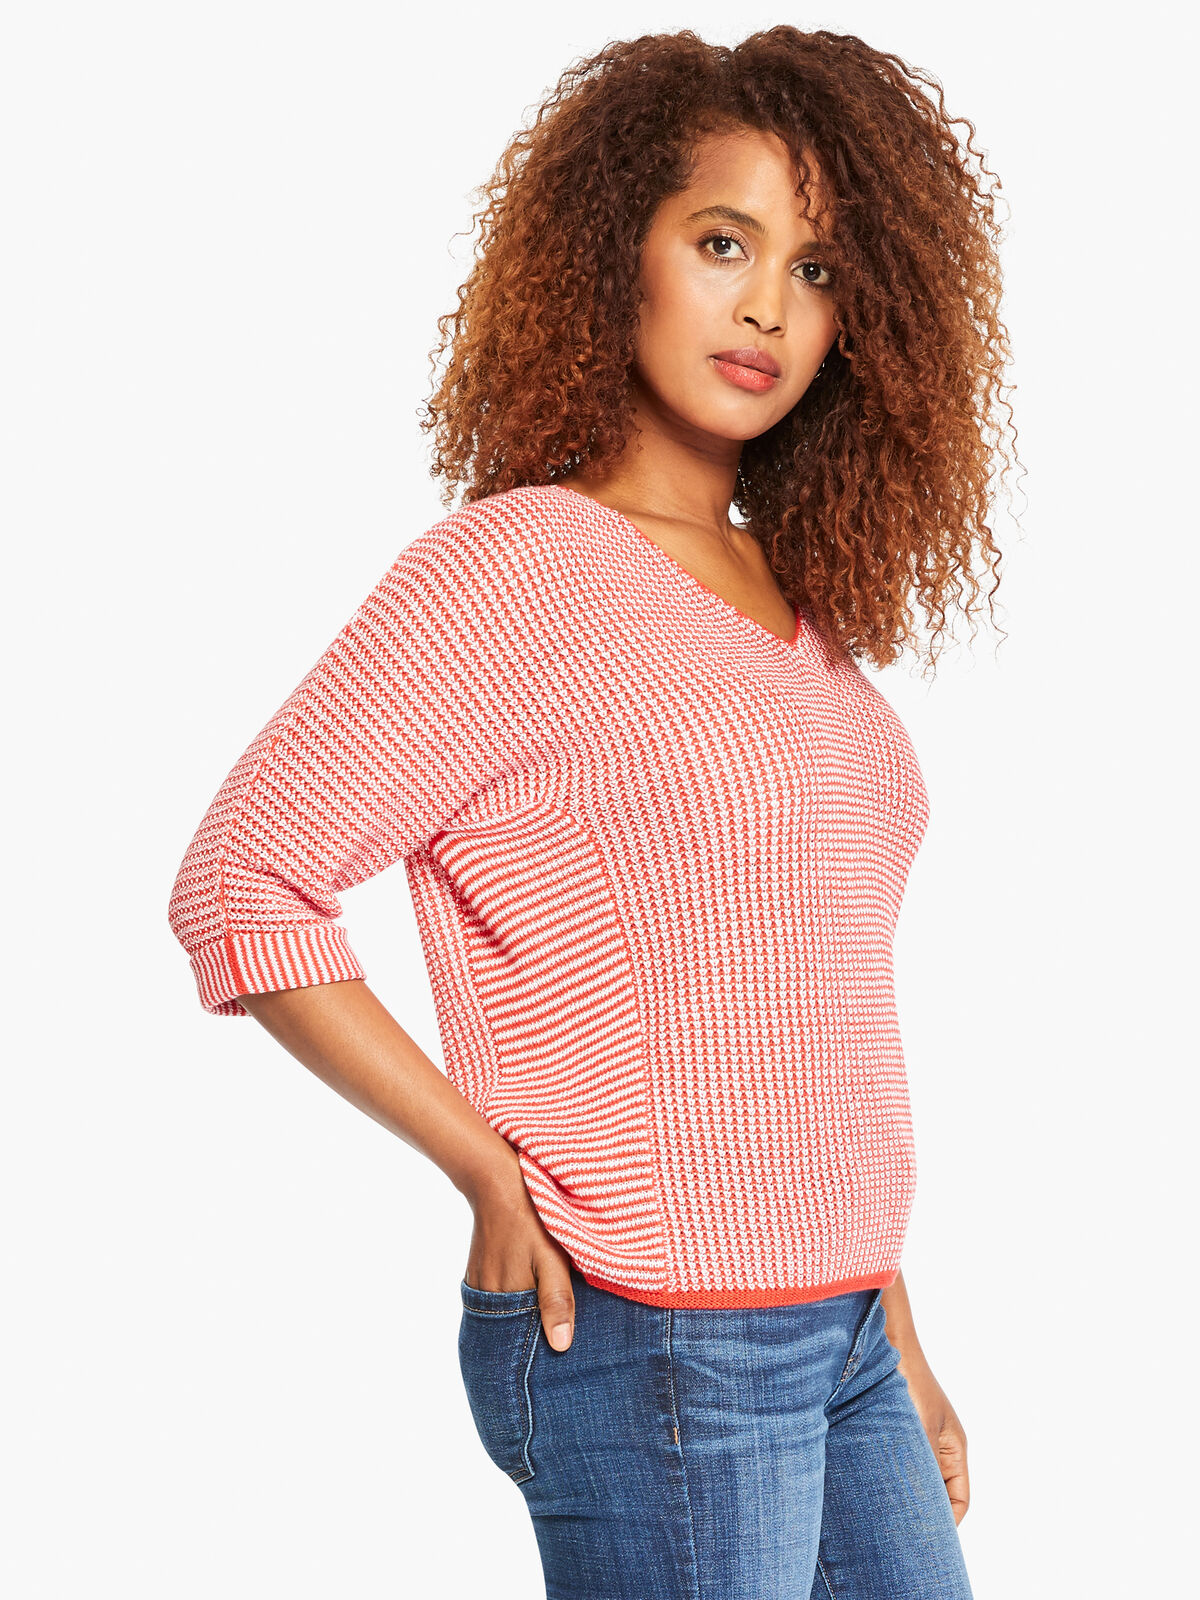 Easy Texture Sweater